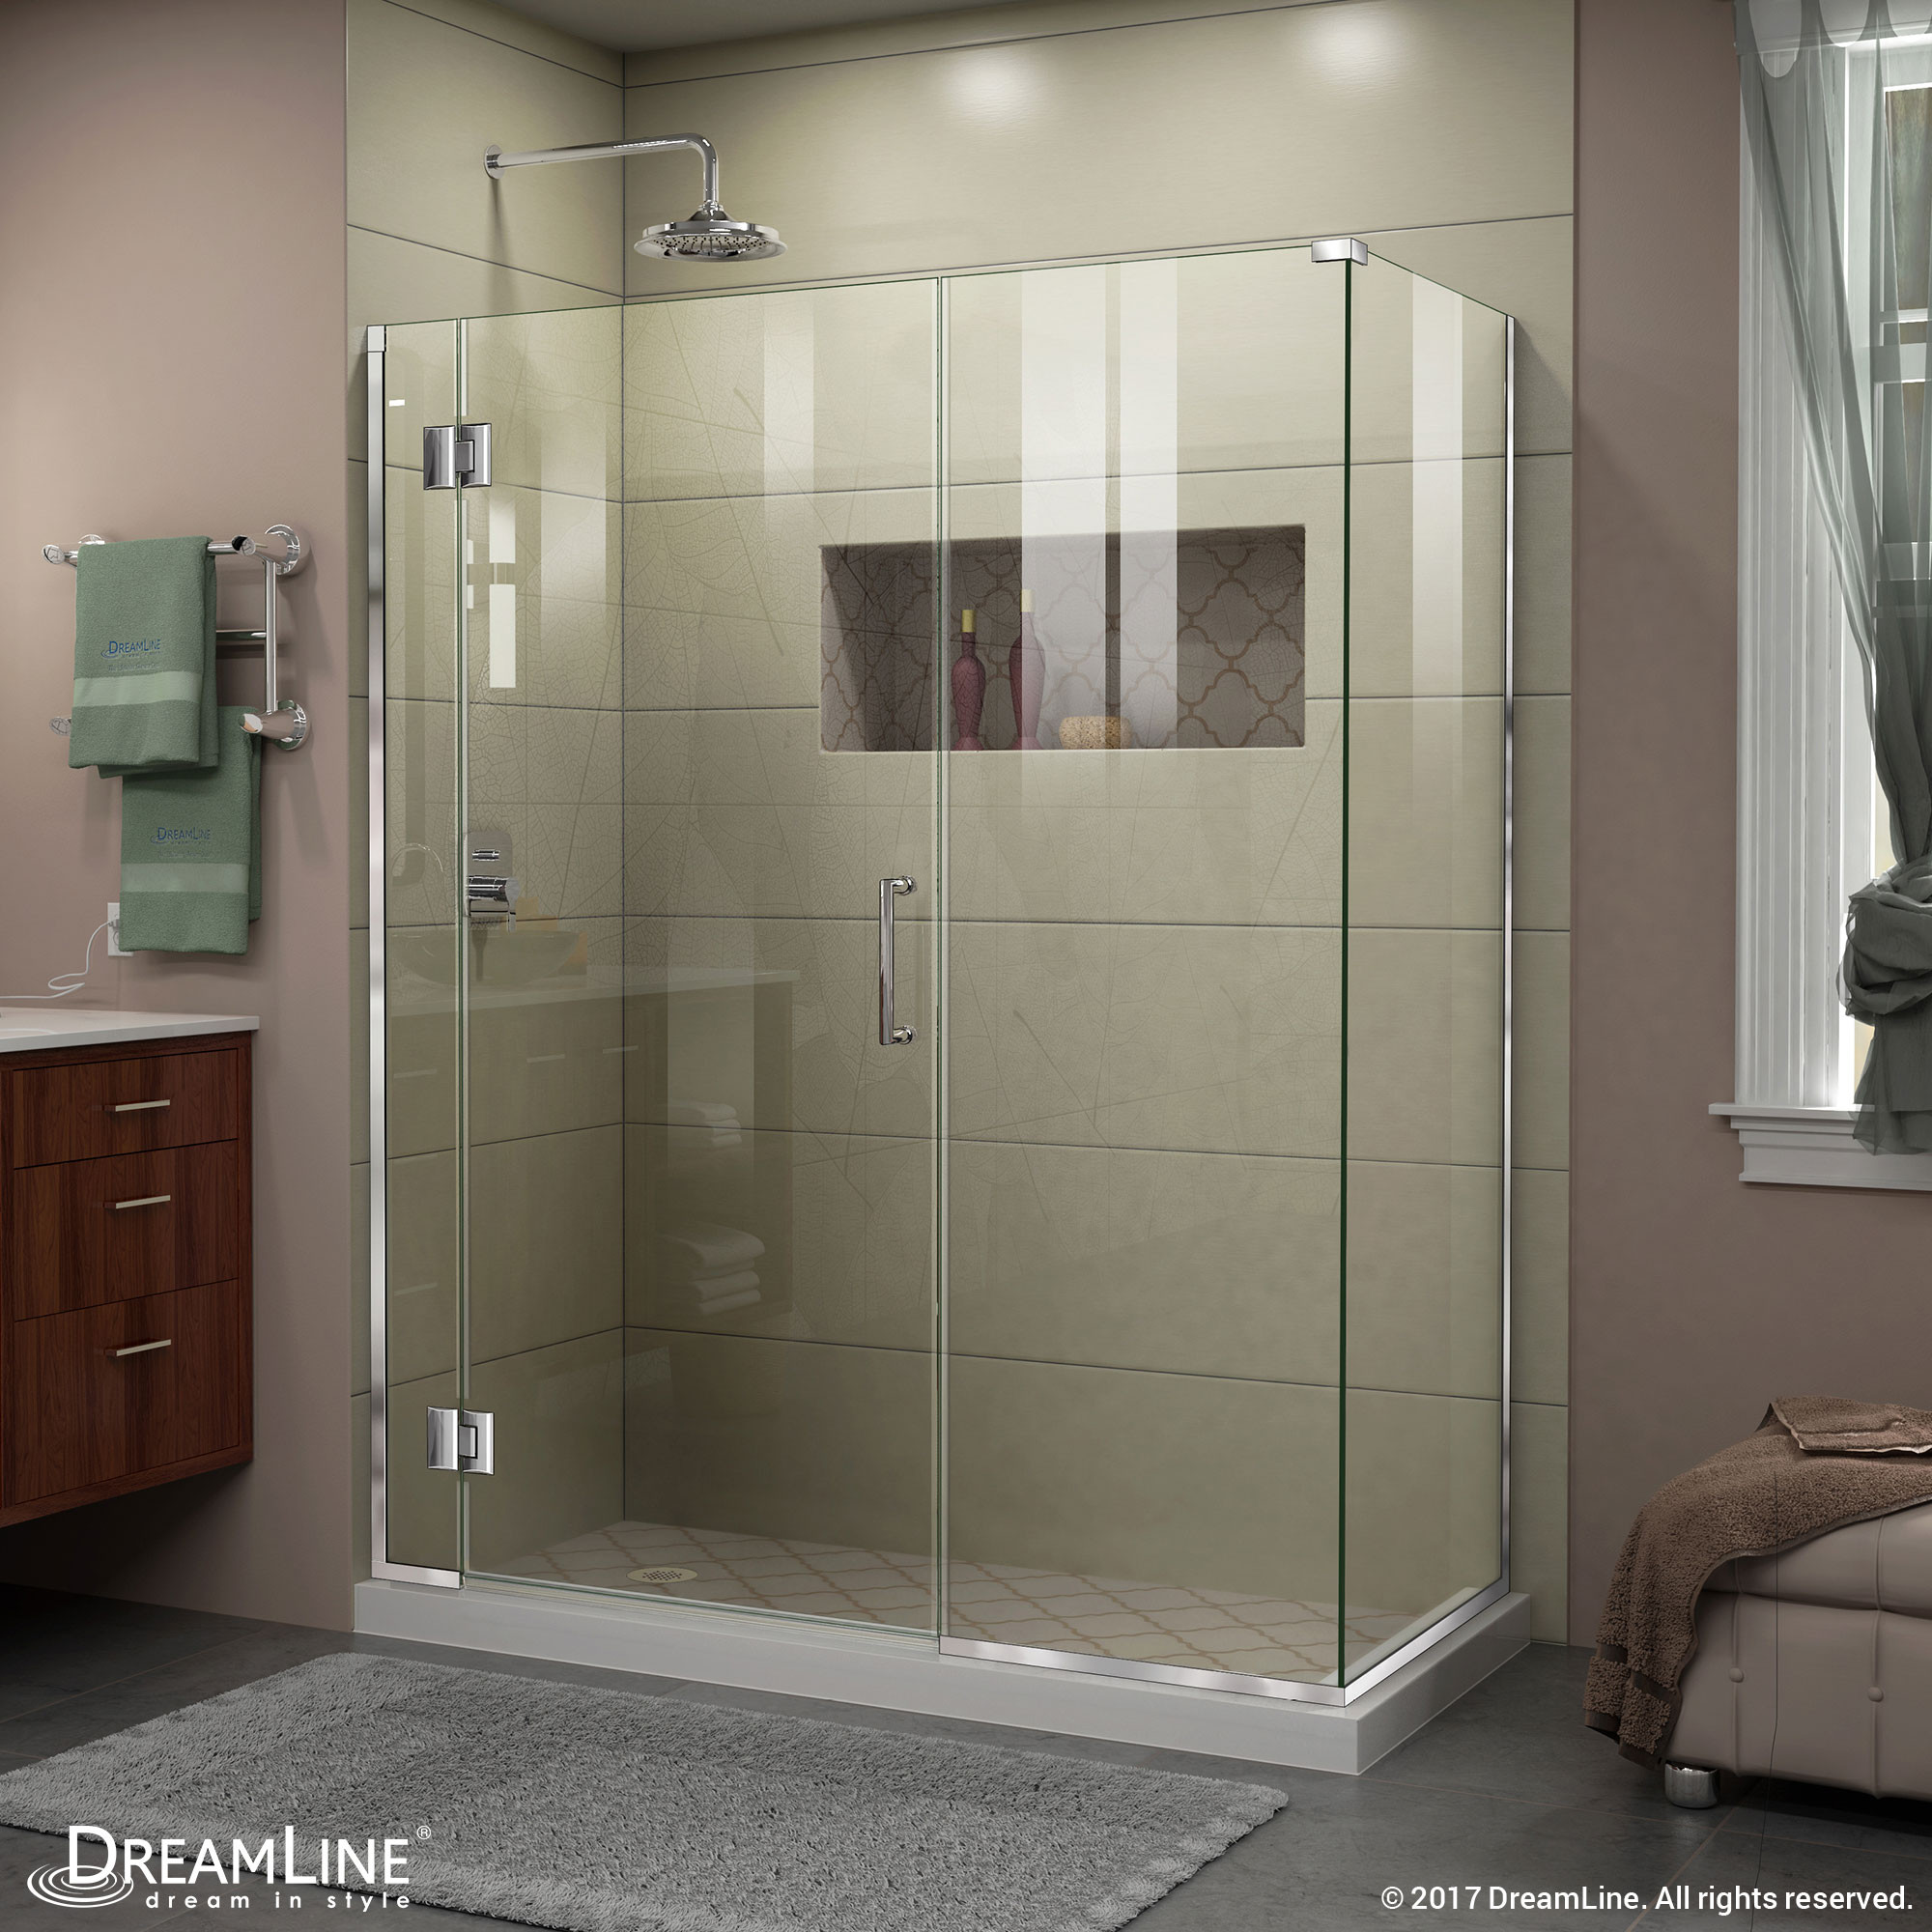 DreamLine E12714530-01 Unidoor-X Hinged Shower Enclosure In Chrome Finish